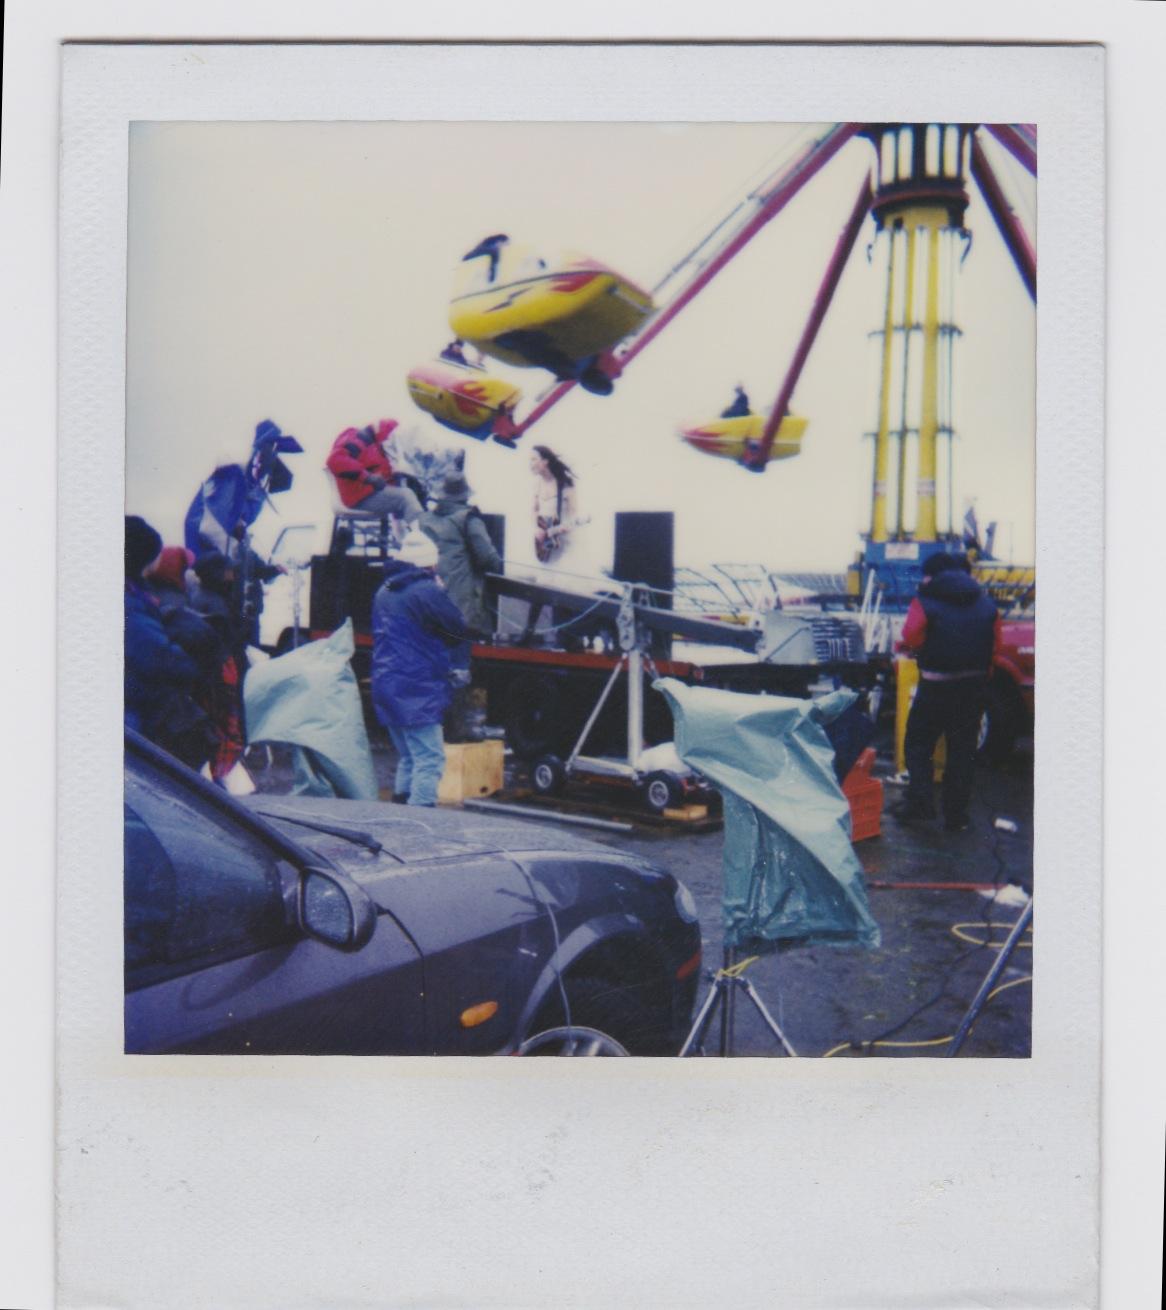 FilmingFordAd1996.jpeg